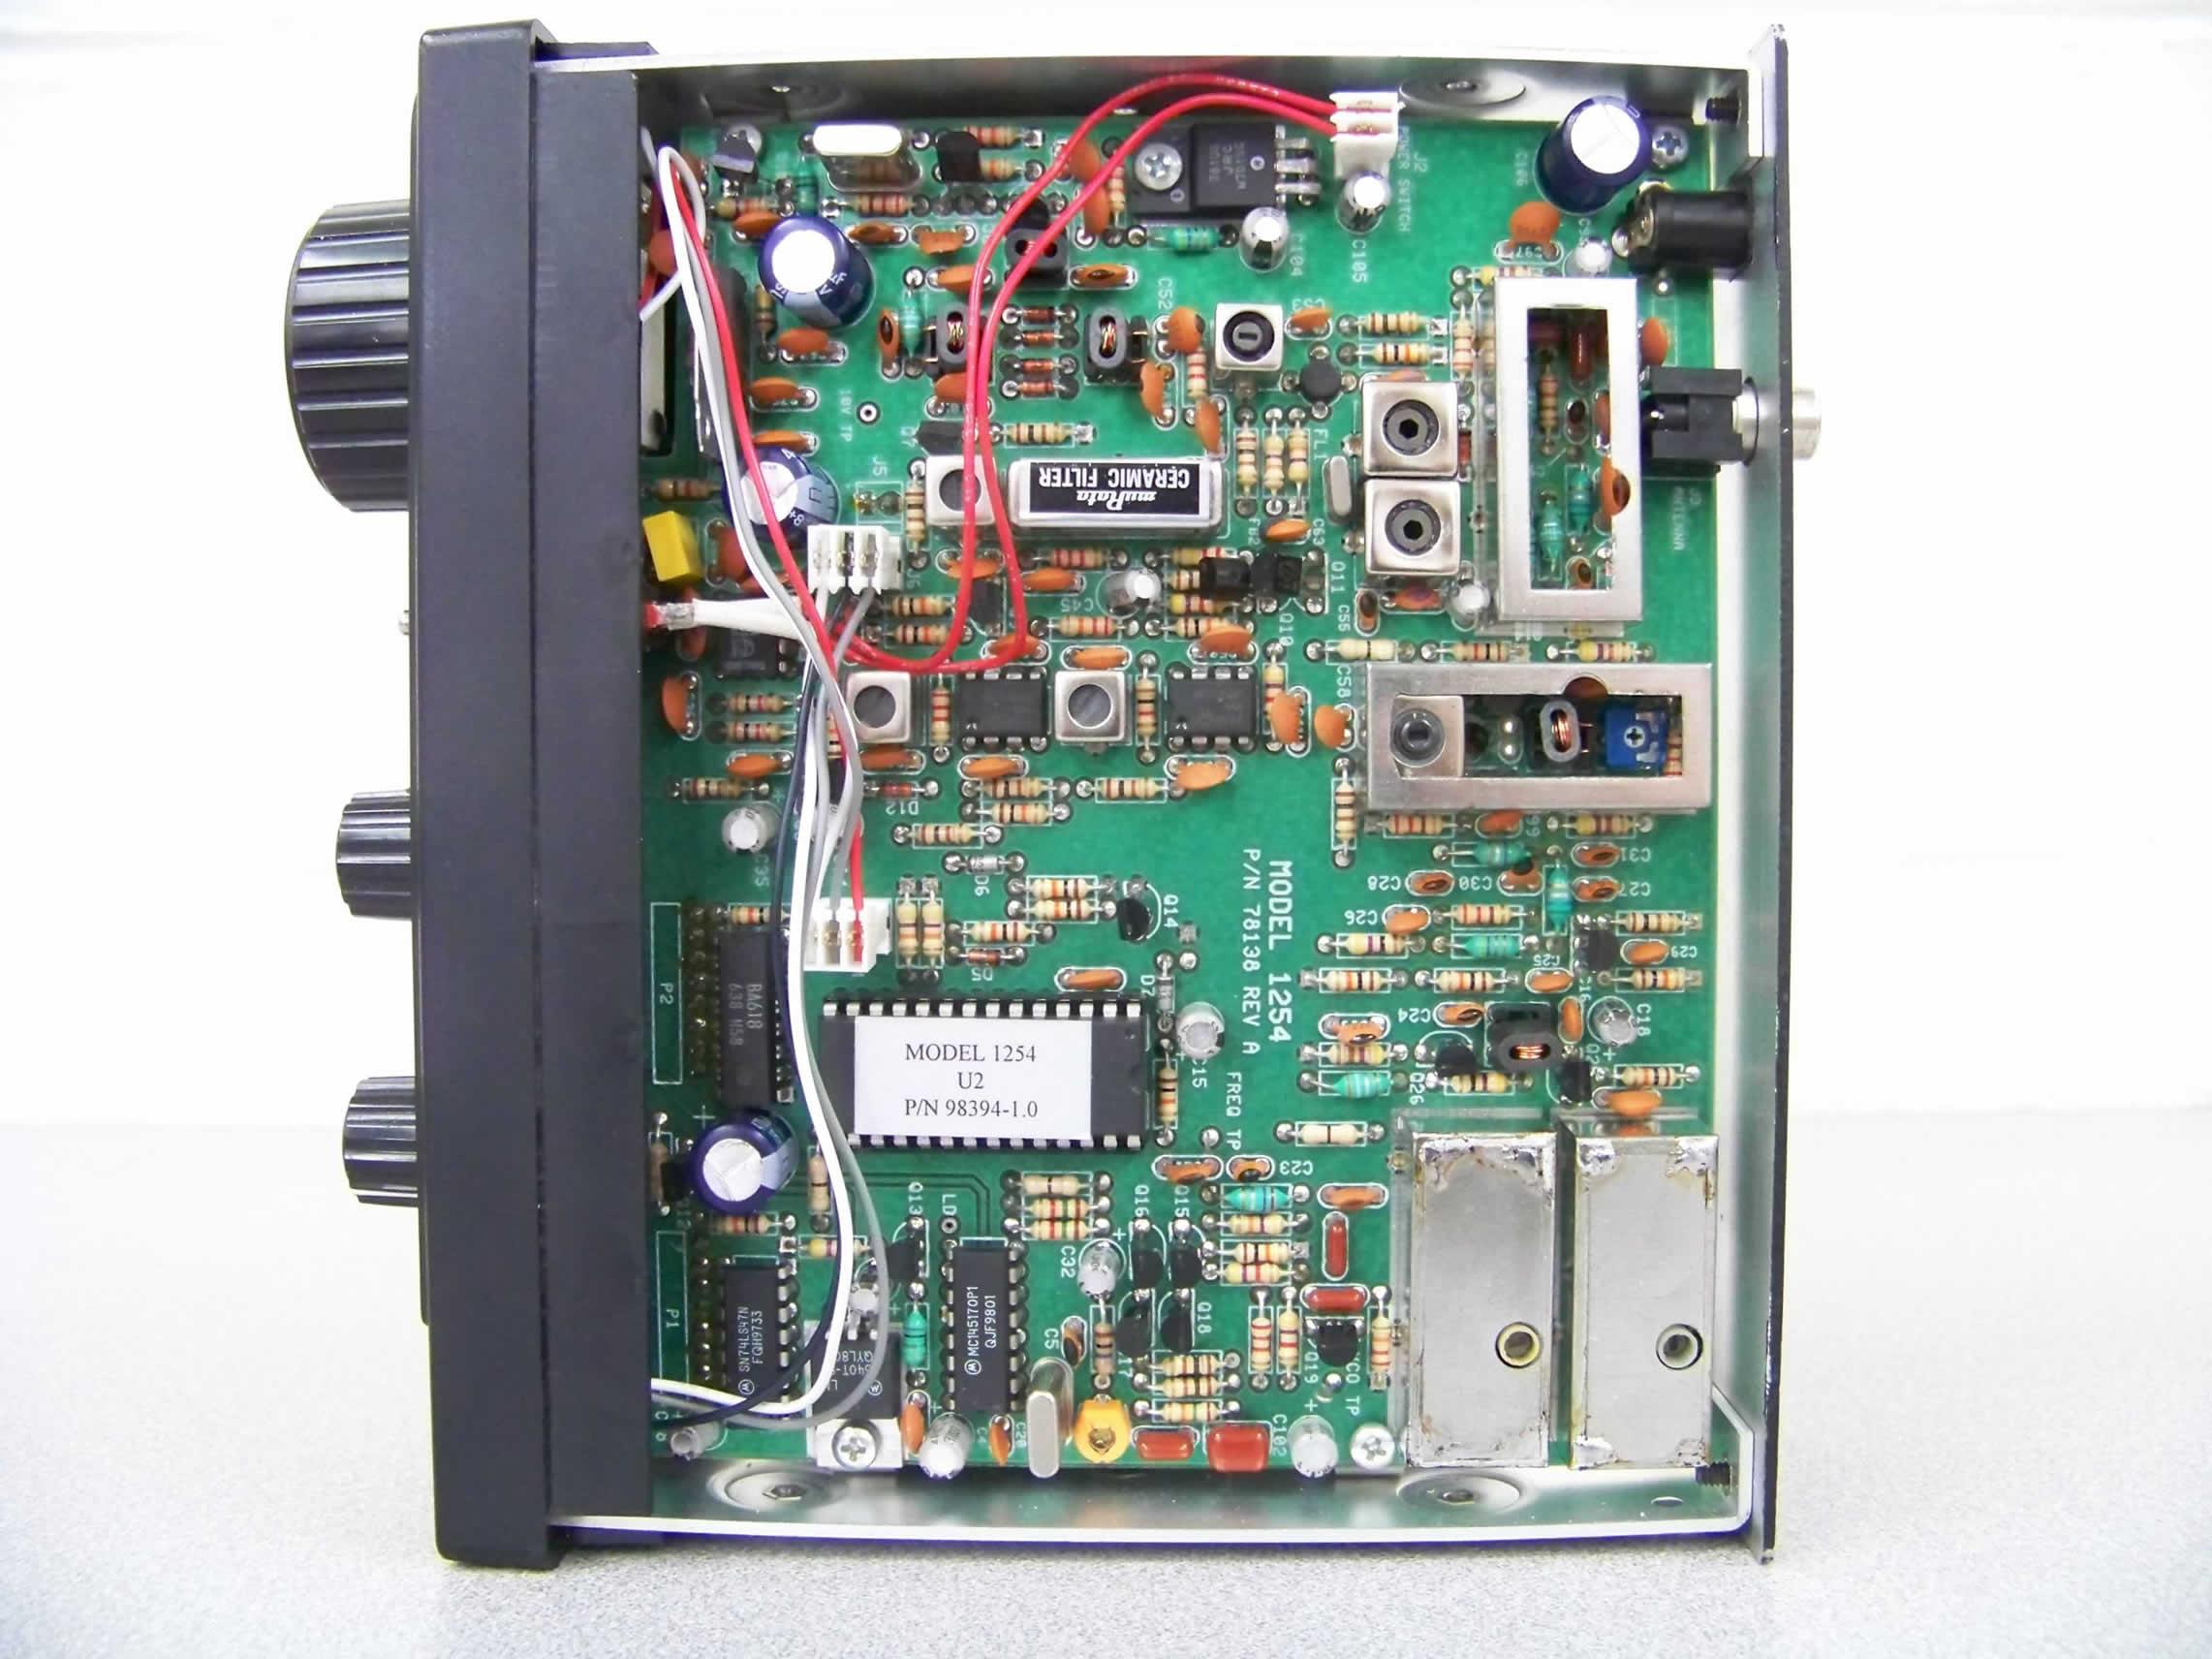 CmVnZW5lcmF0aXZlIHJhZGlvIHJlY2VpdmVyIGtpdHM further Inventables The Hardware Store For Designers 5m In Funding 10m So Far further Shortwave Regenerative Receiver Schematic furthermore Ham Radio Go Kit Em M in addition Tec1056. on ten tec shortwave radio receiver kits